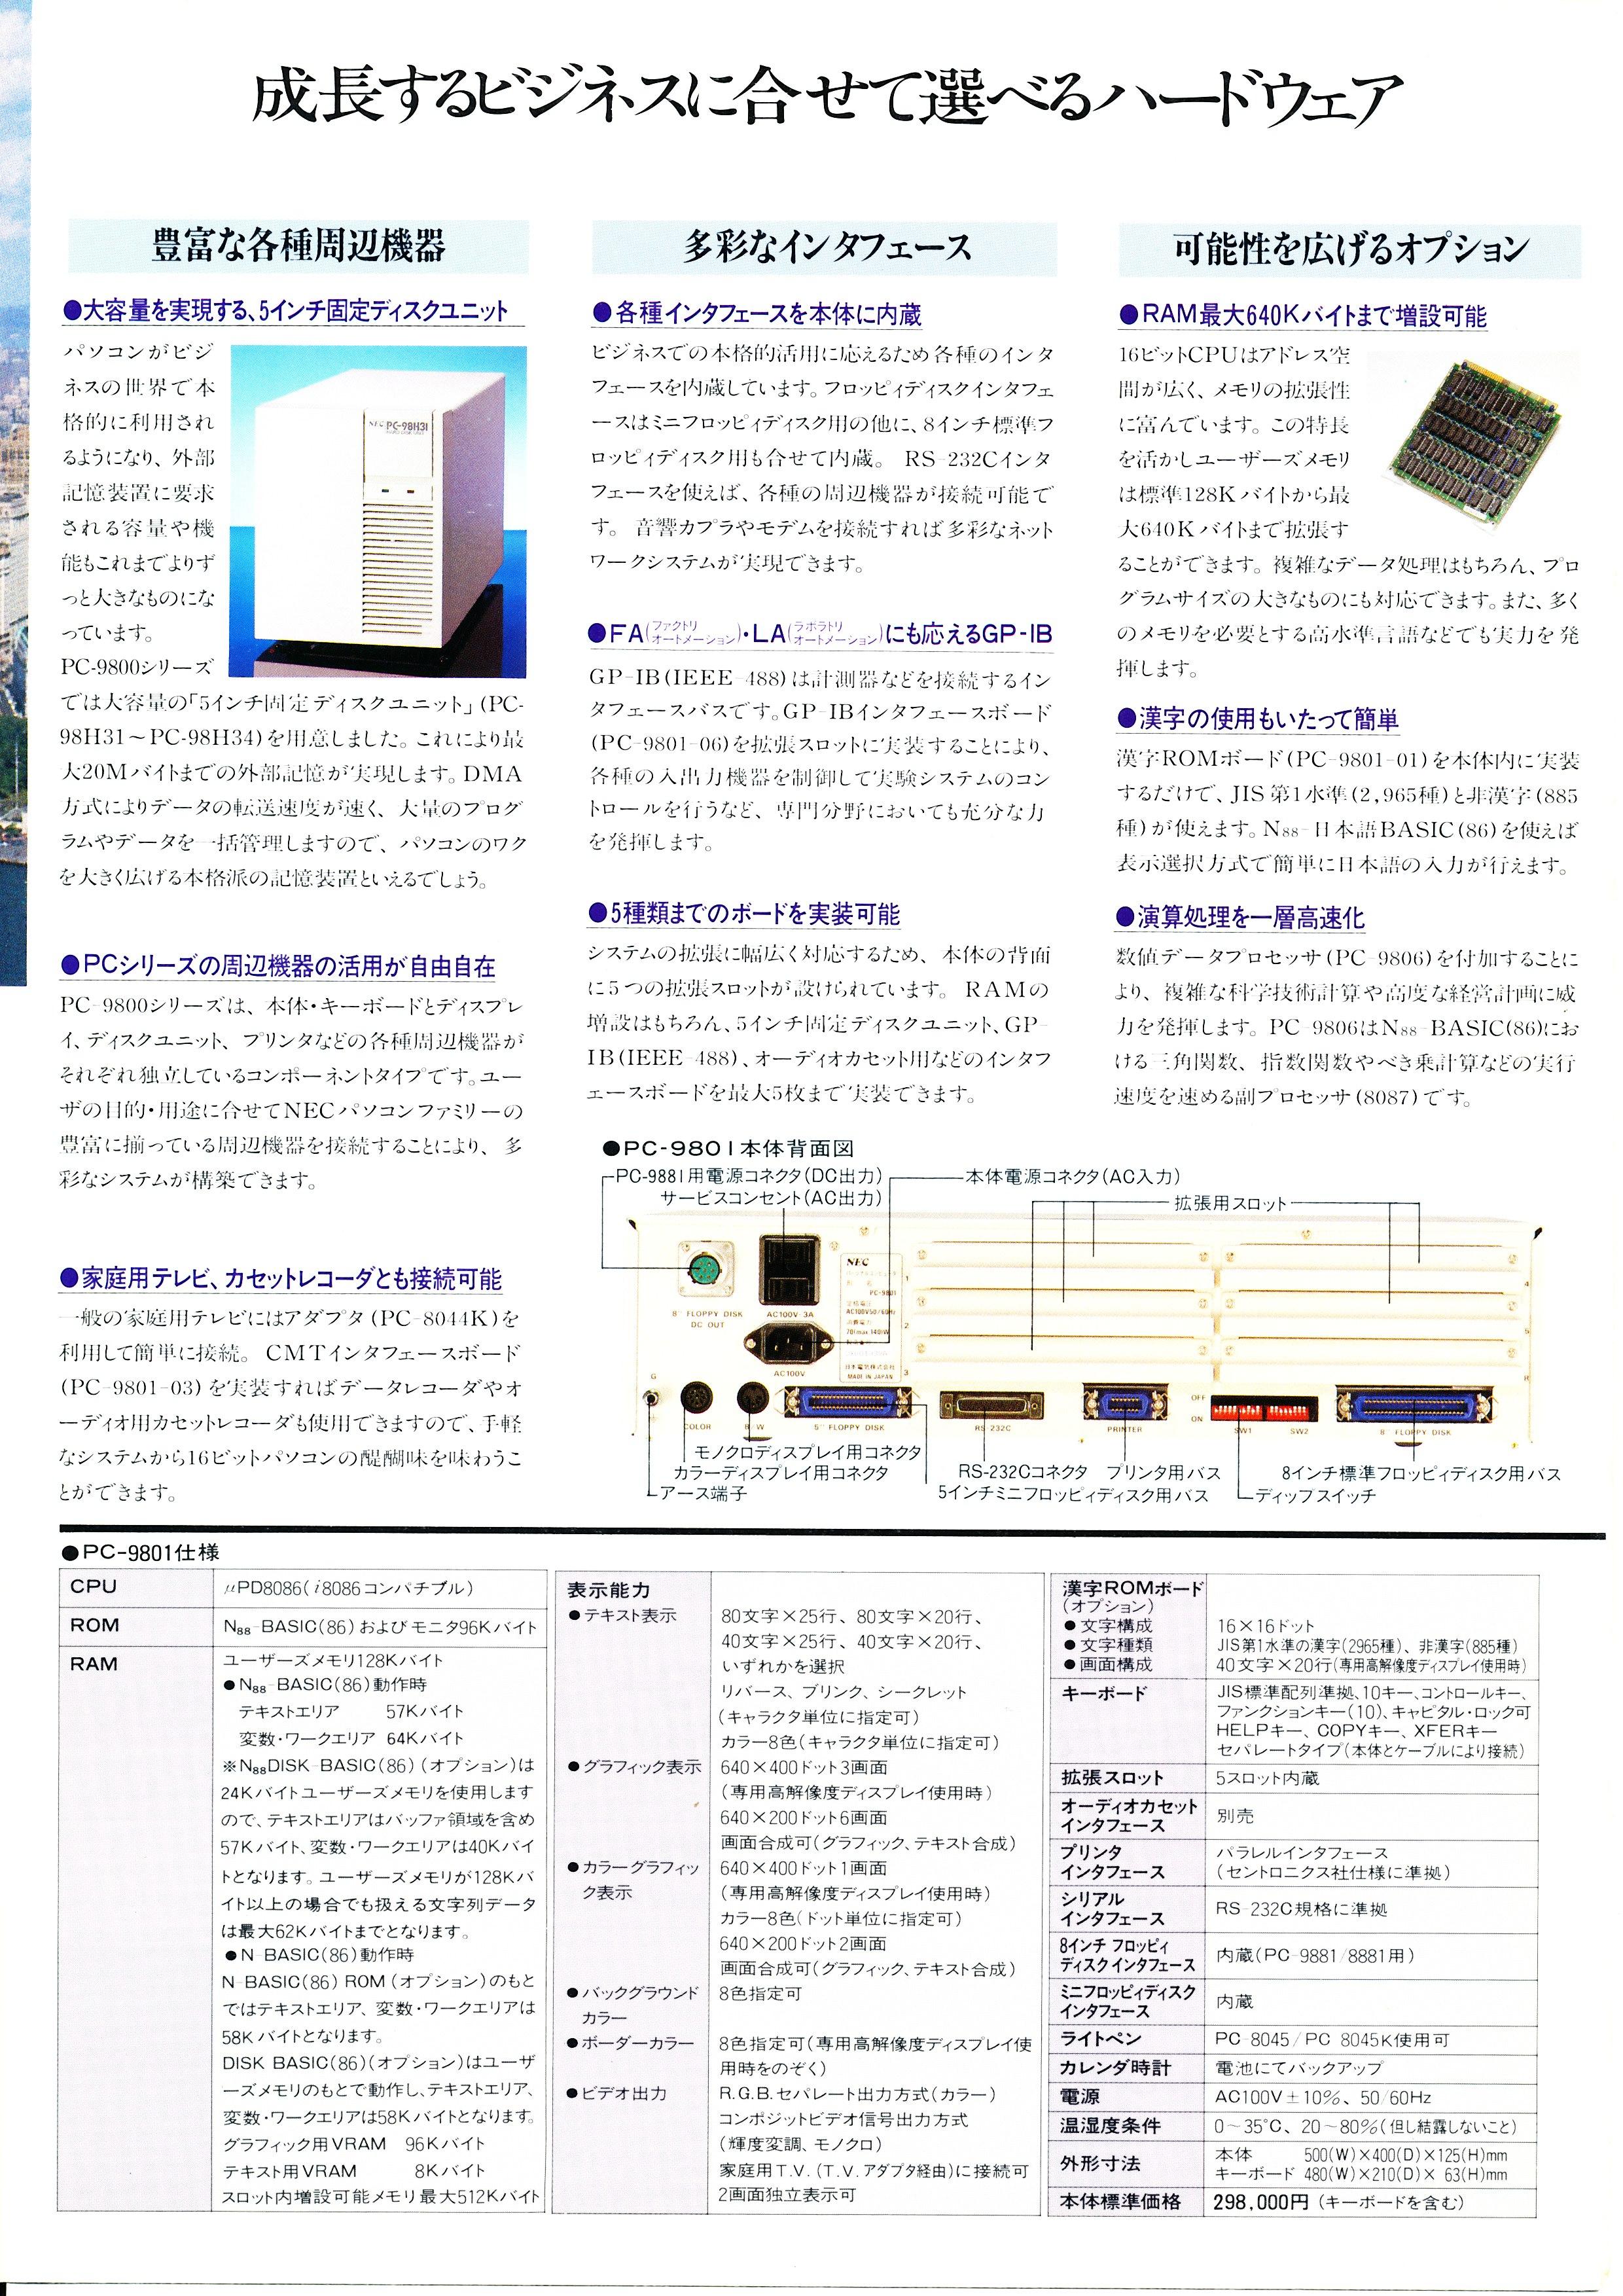 PC-9801 P6